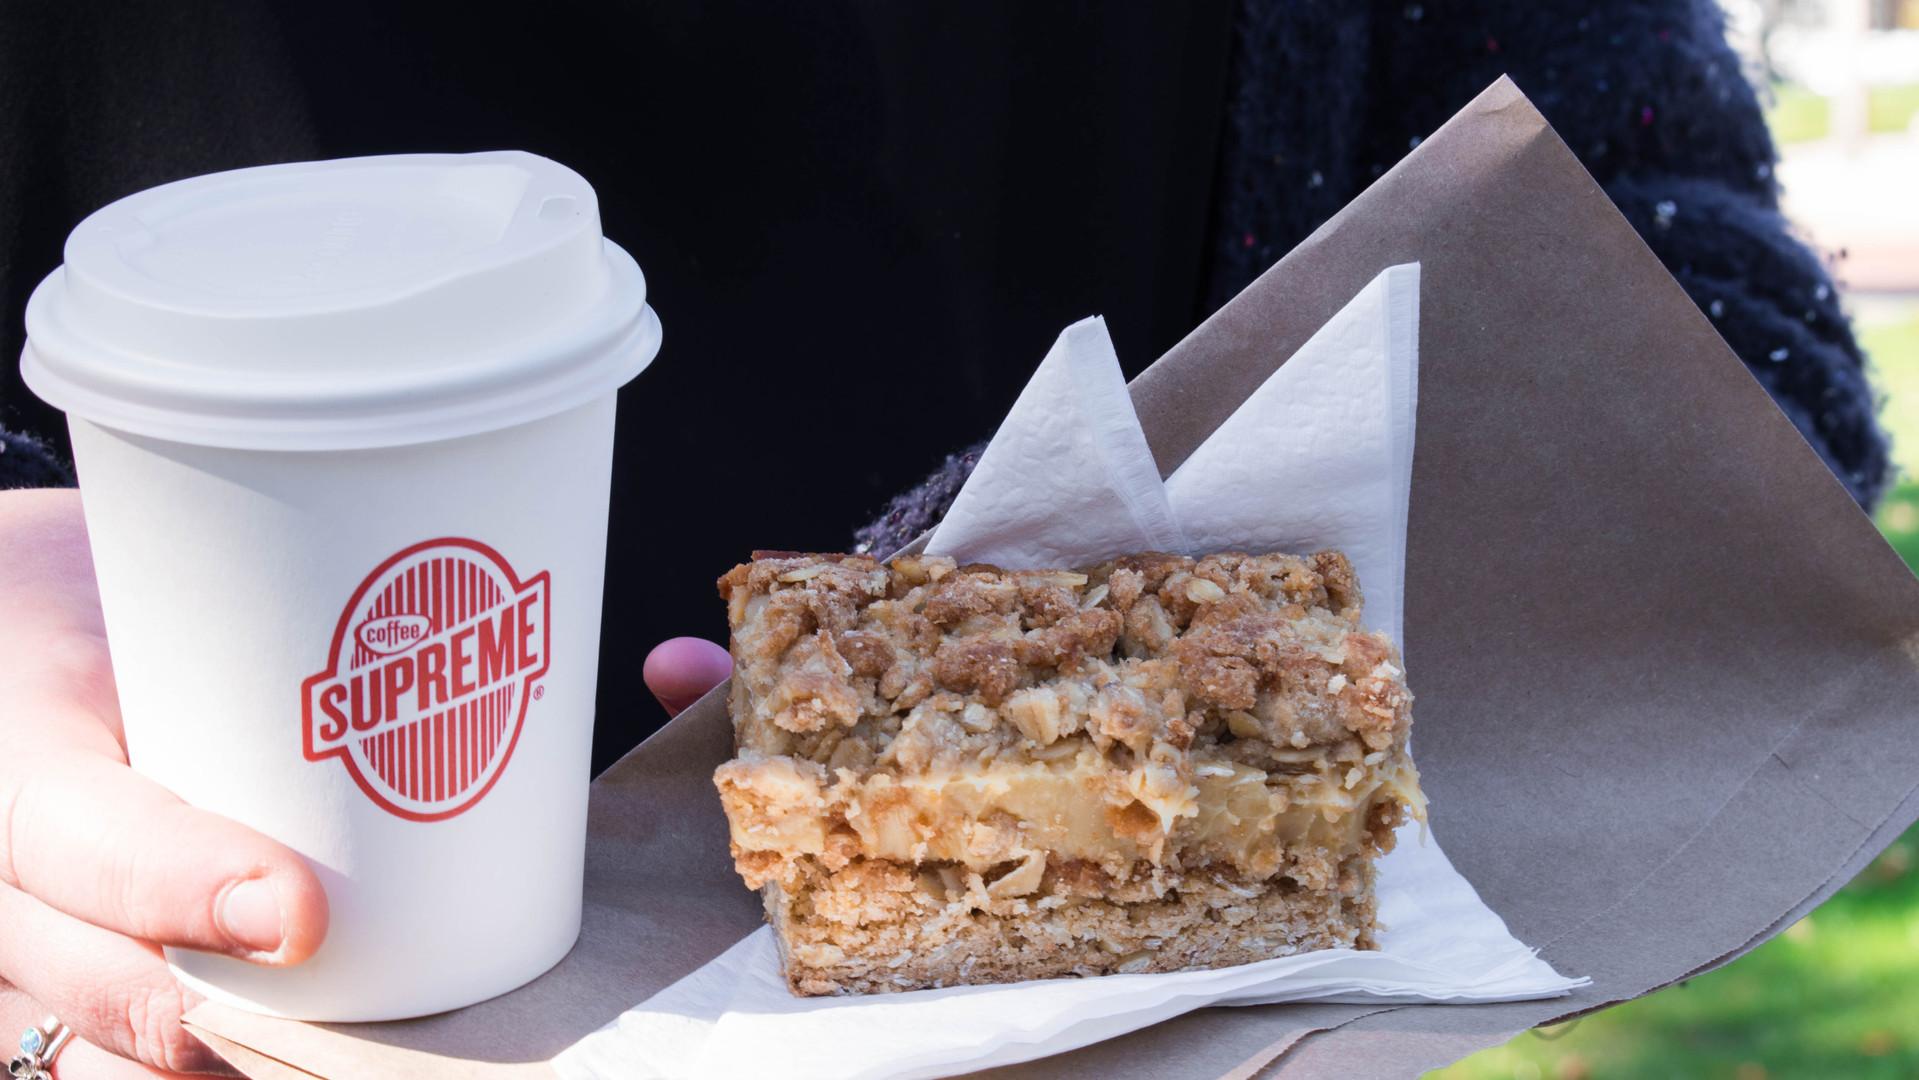 Coffee and an Oaty caramel slice